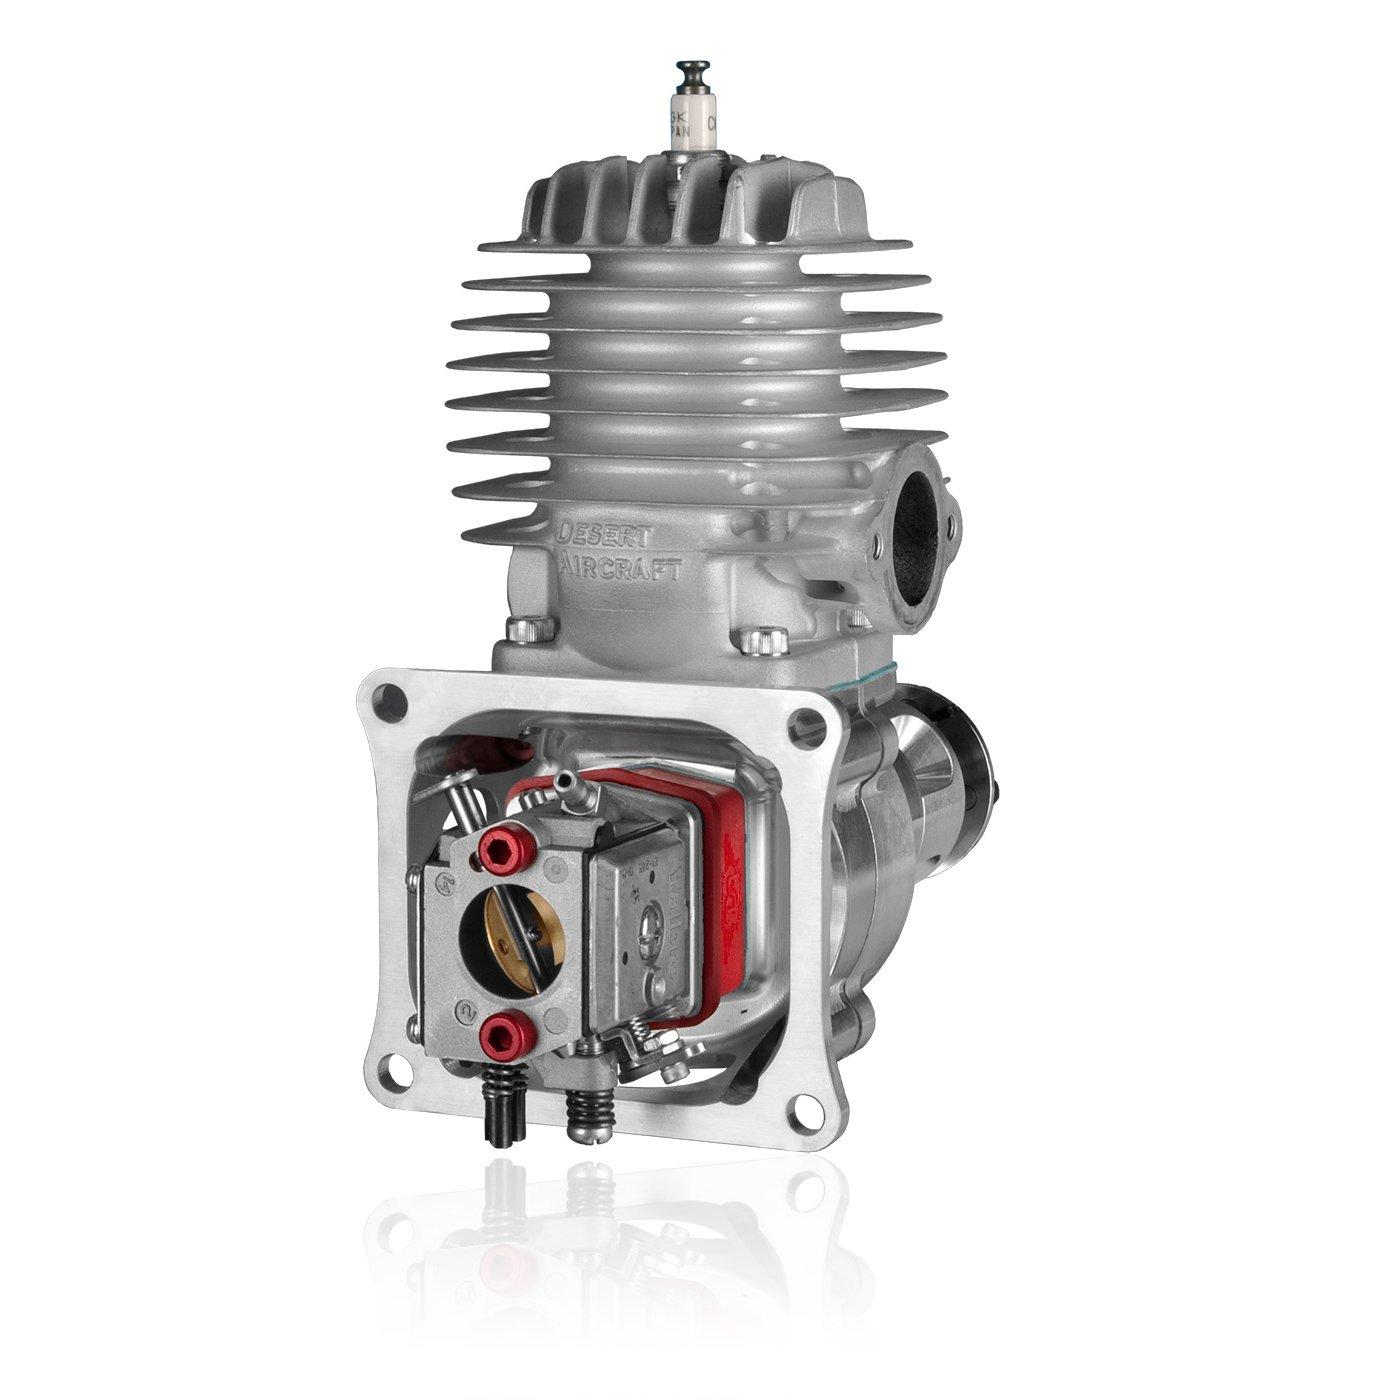 Desert Aircraft 60cc Single Petrol Engine - DA-60 - Rs 58,091 00